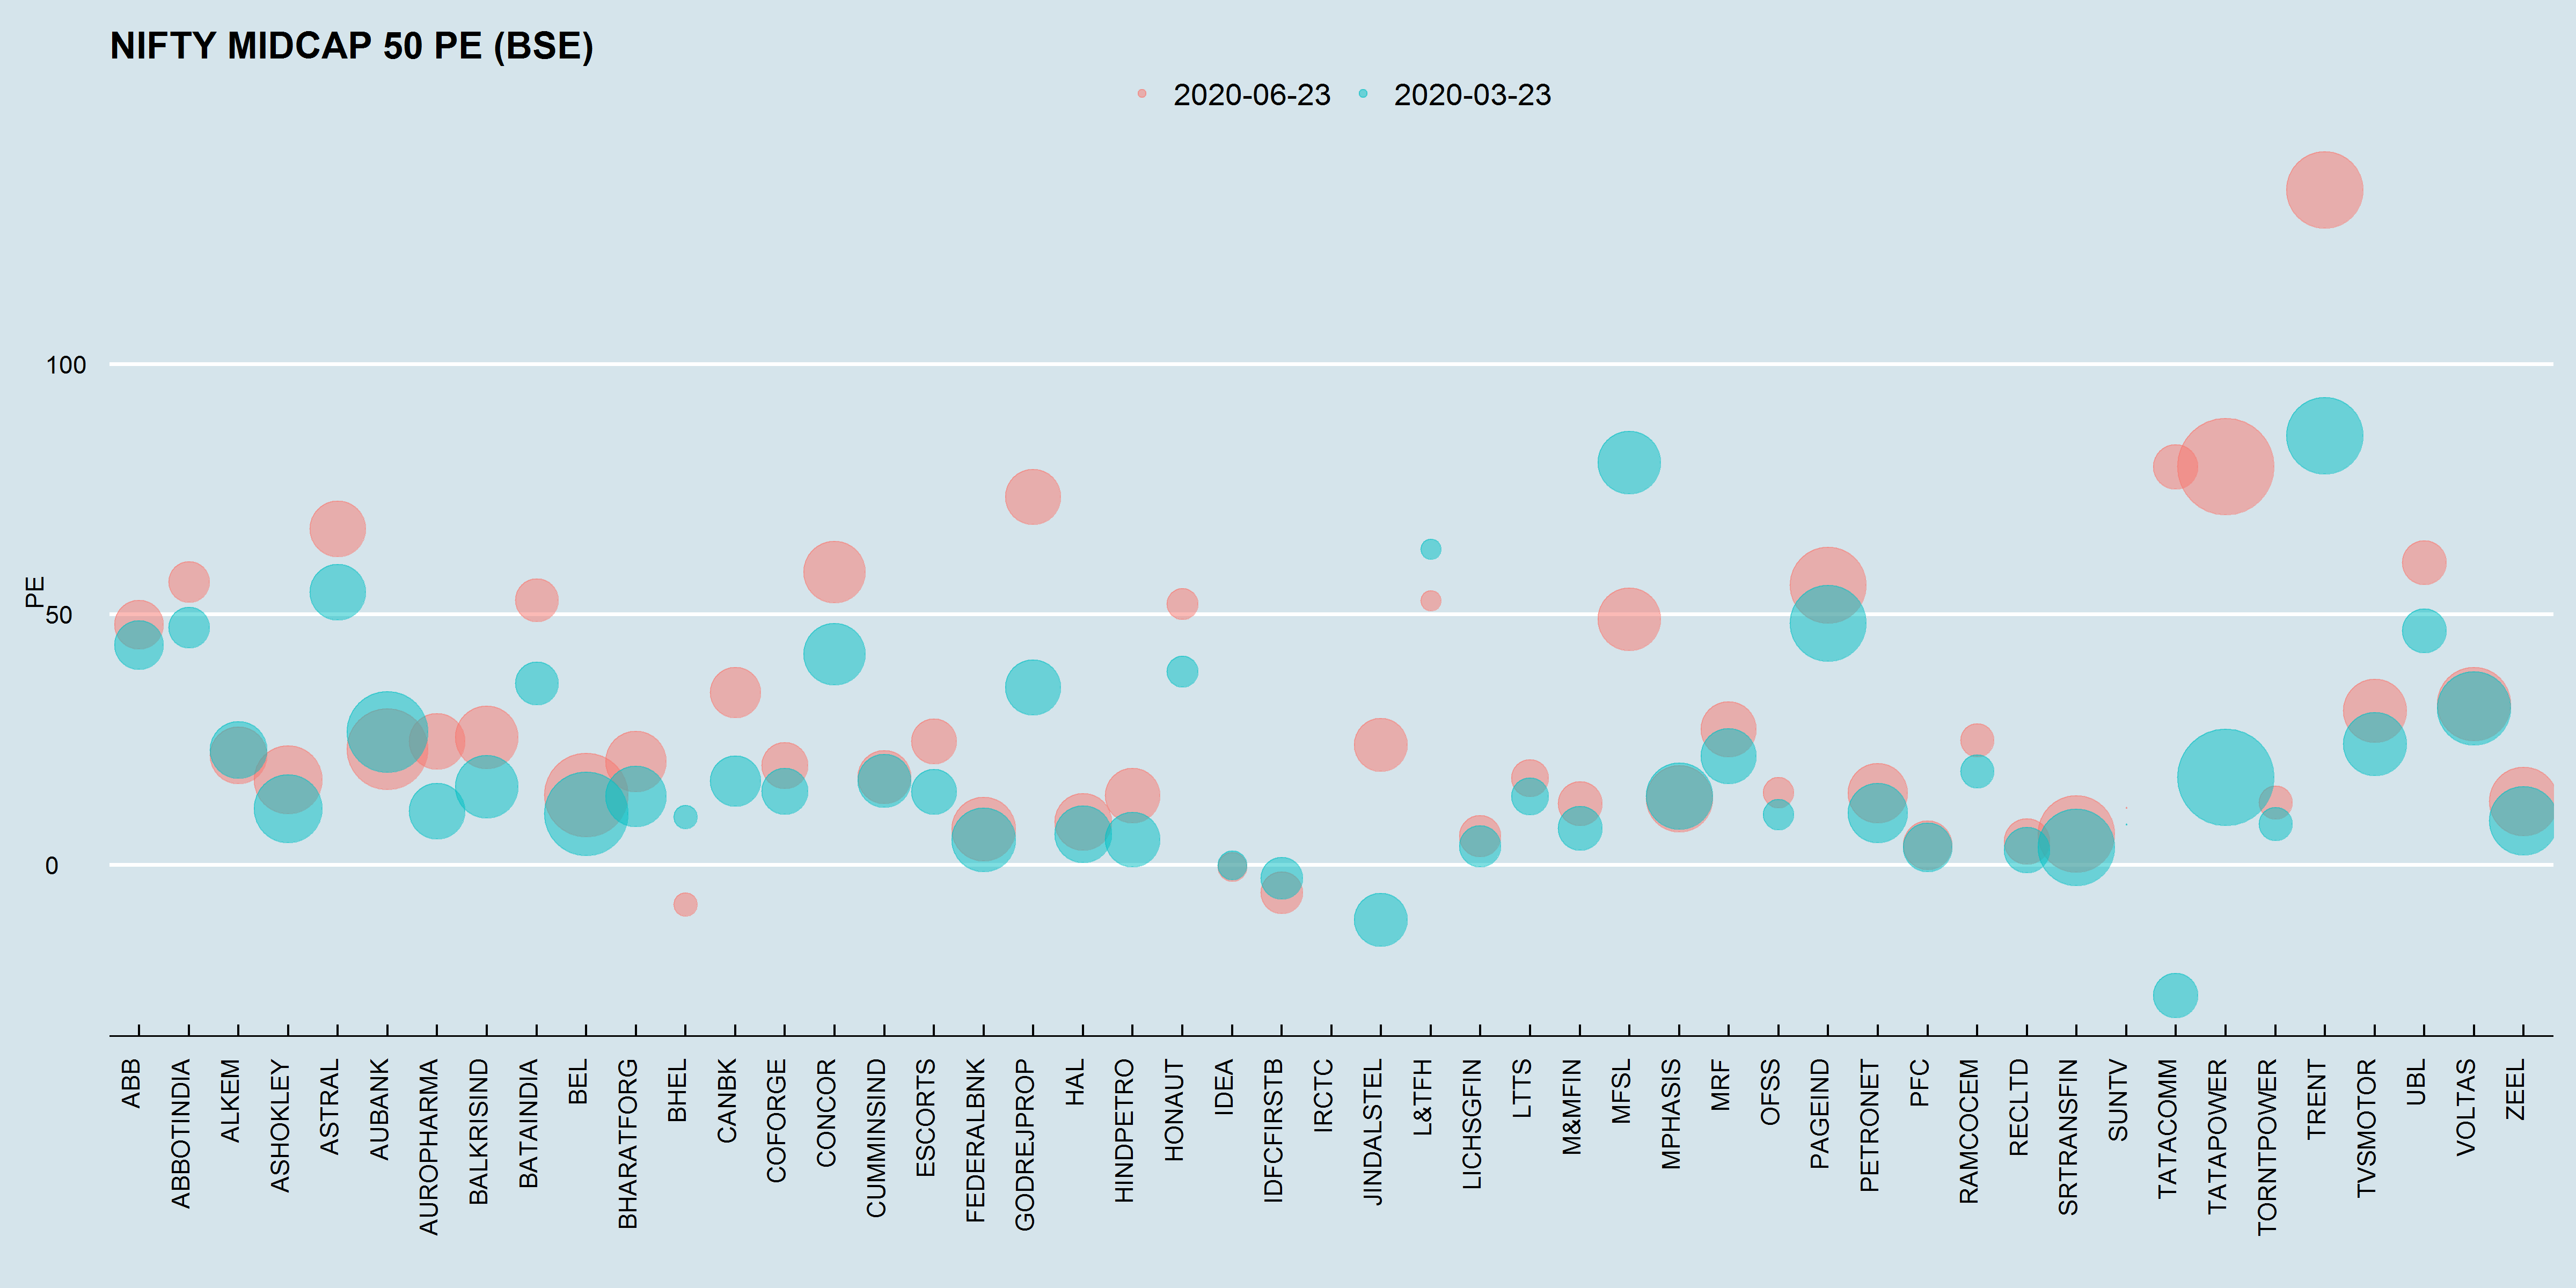 NIFTY MIDCAP 50-Constituents png chart